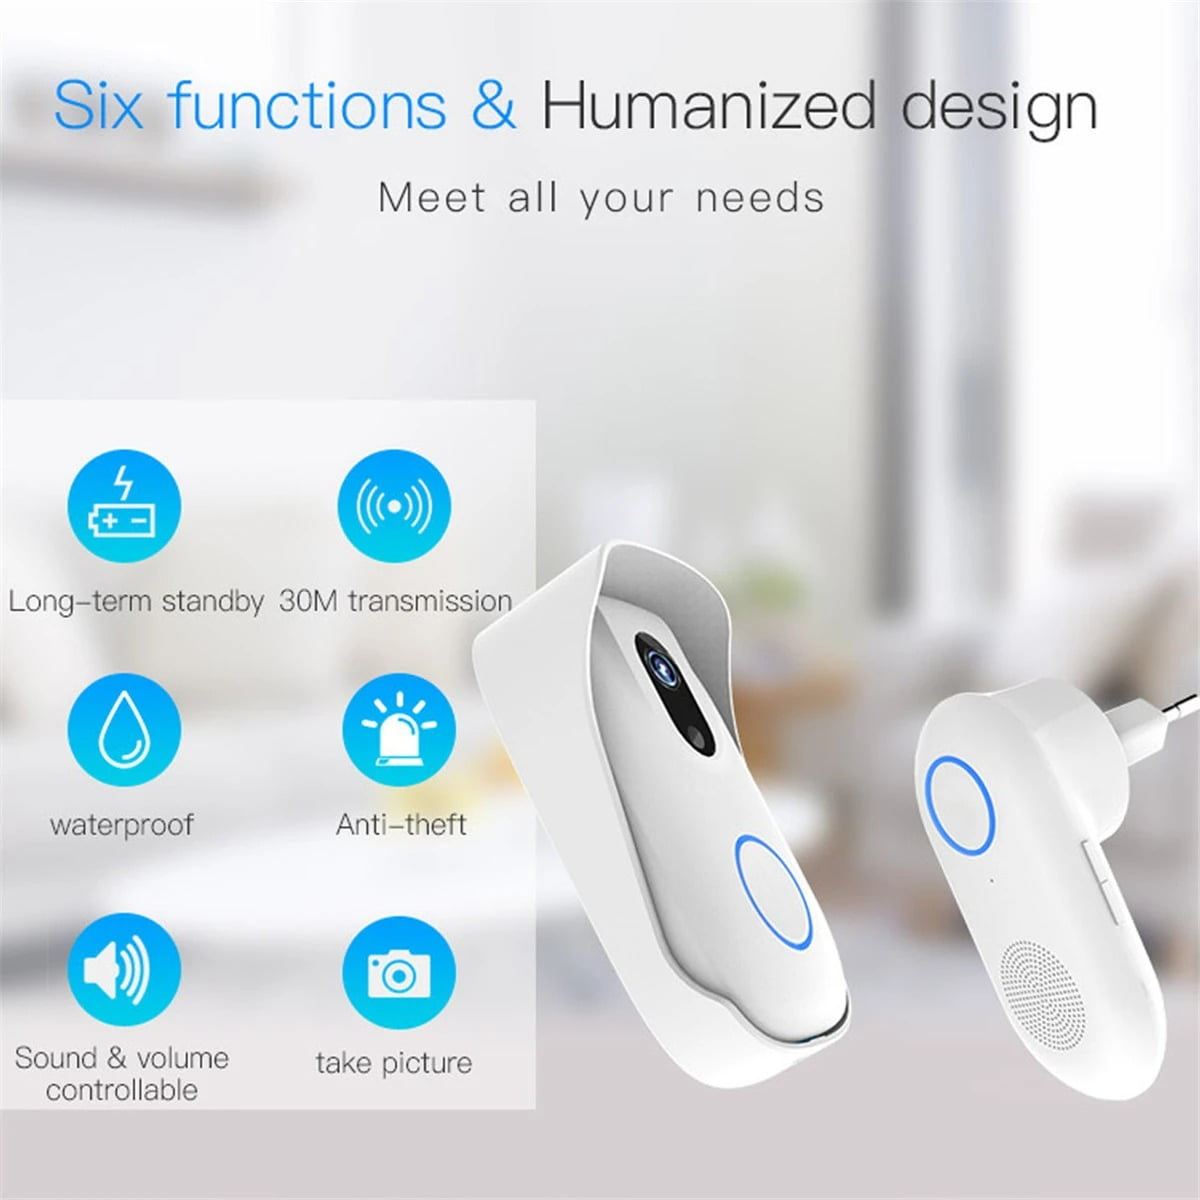 SH02 Smart Wireless Doorbell Lens Video HD Security Camera Night Vision App Control (13)